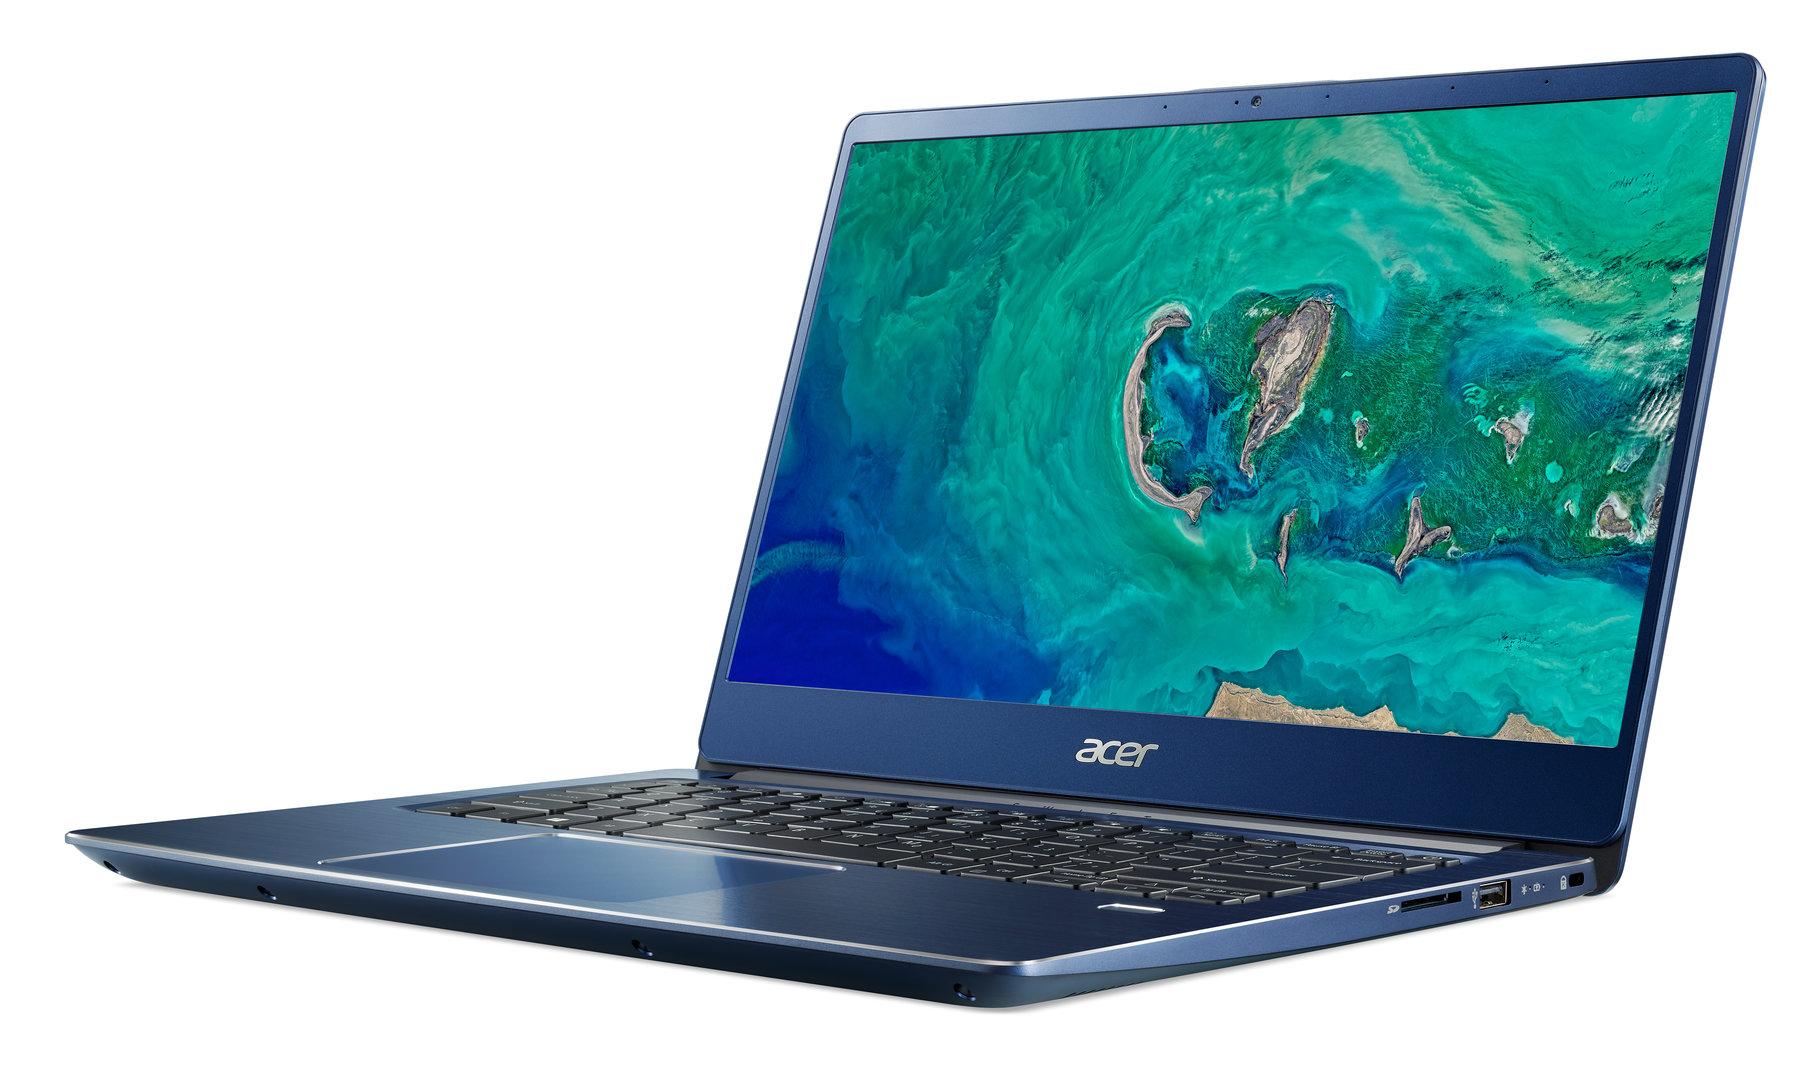 Acer Swift 3 (2018) (14 Zoll) (Blau)